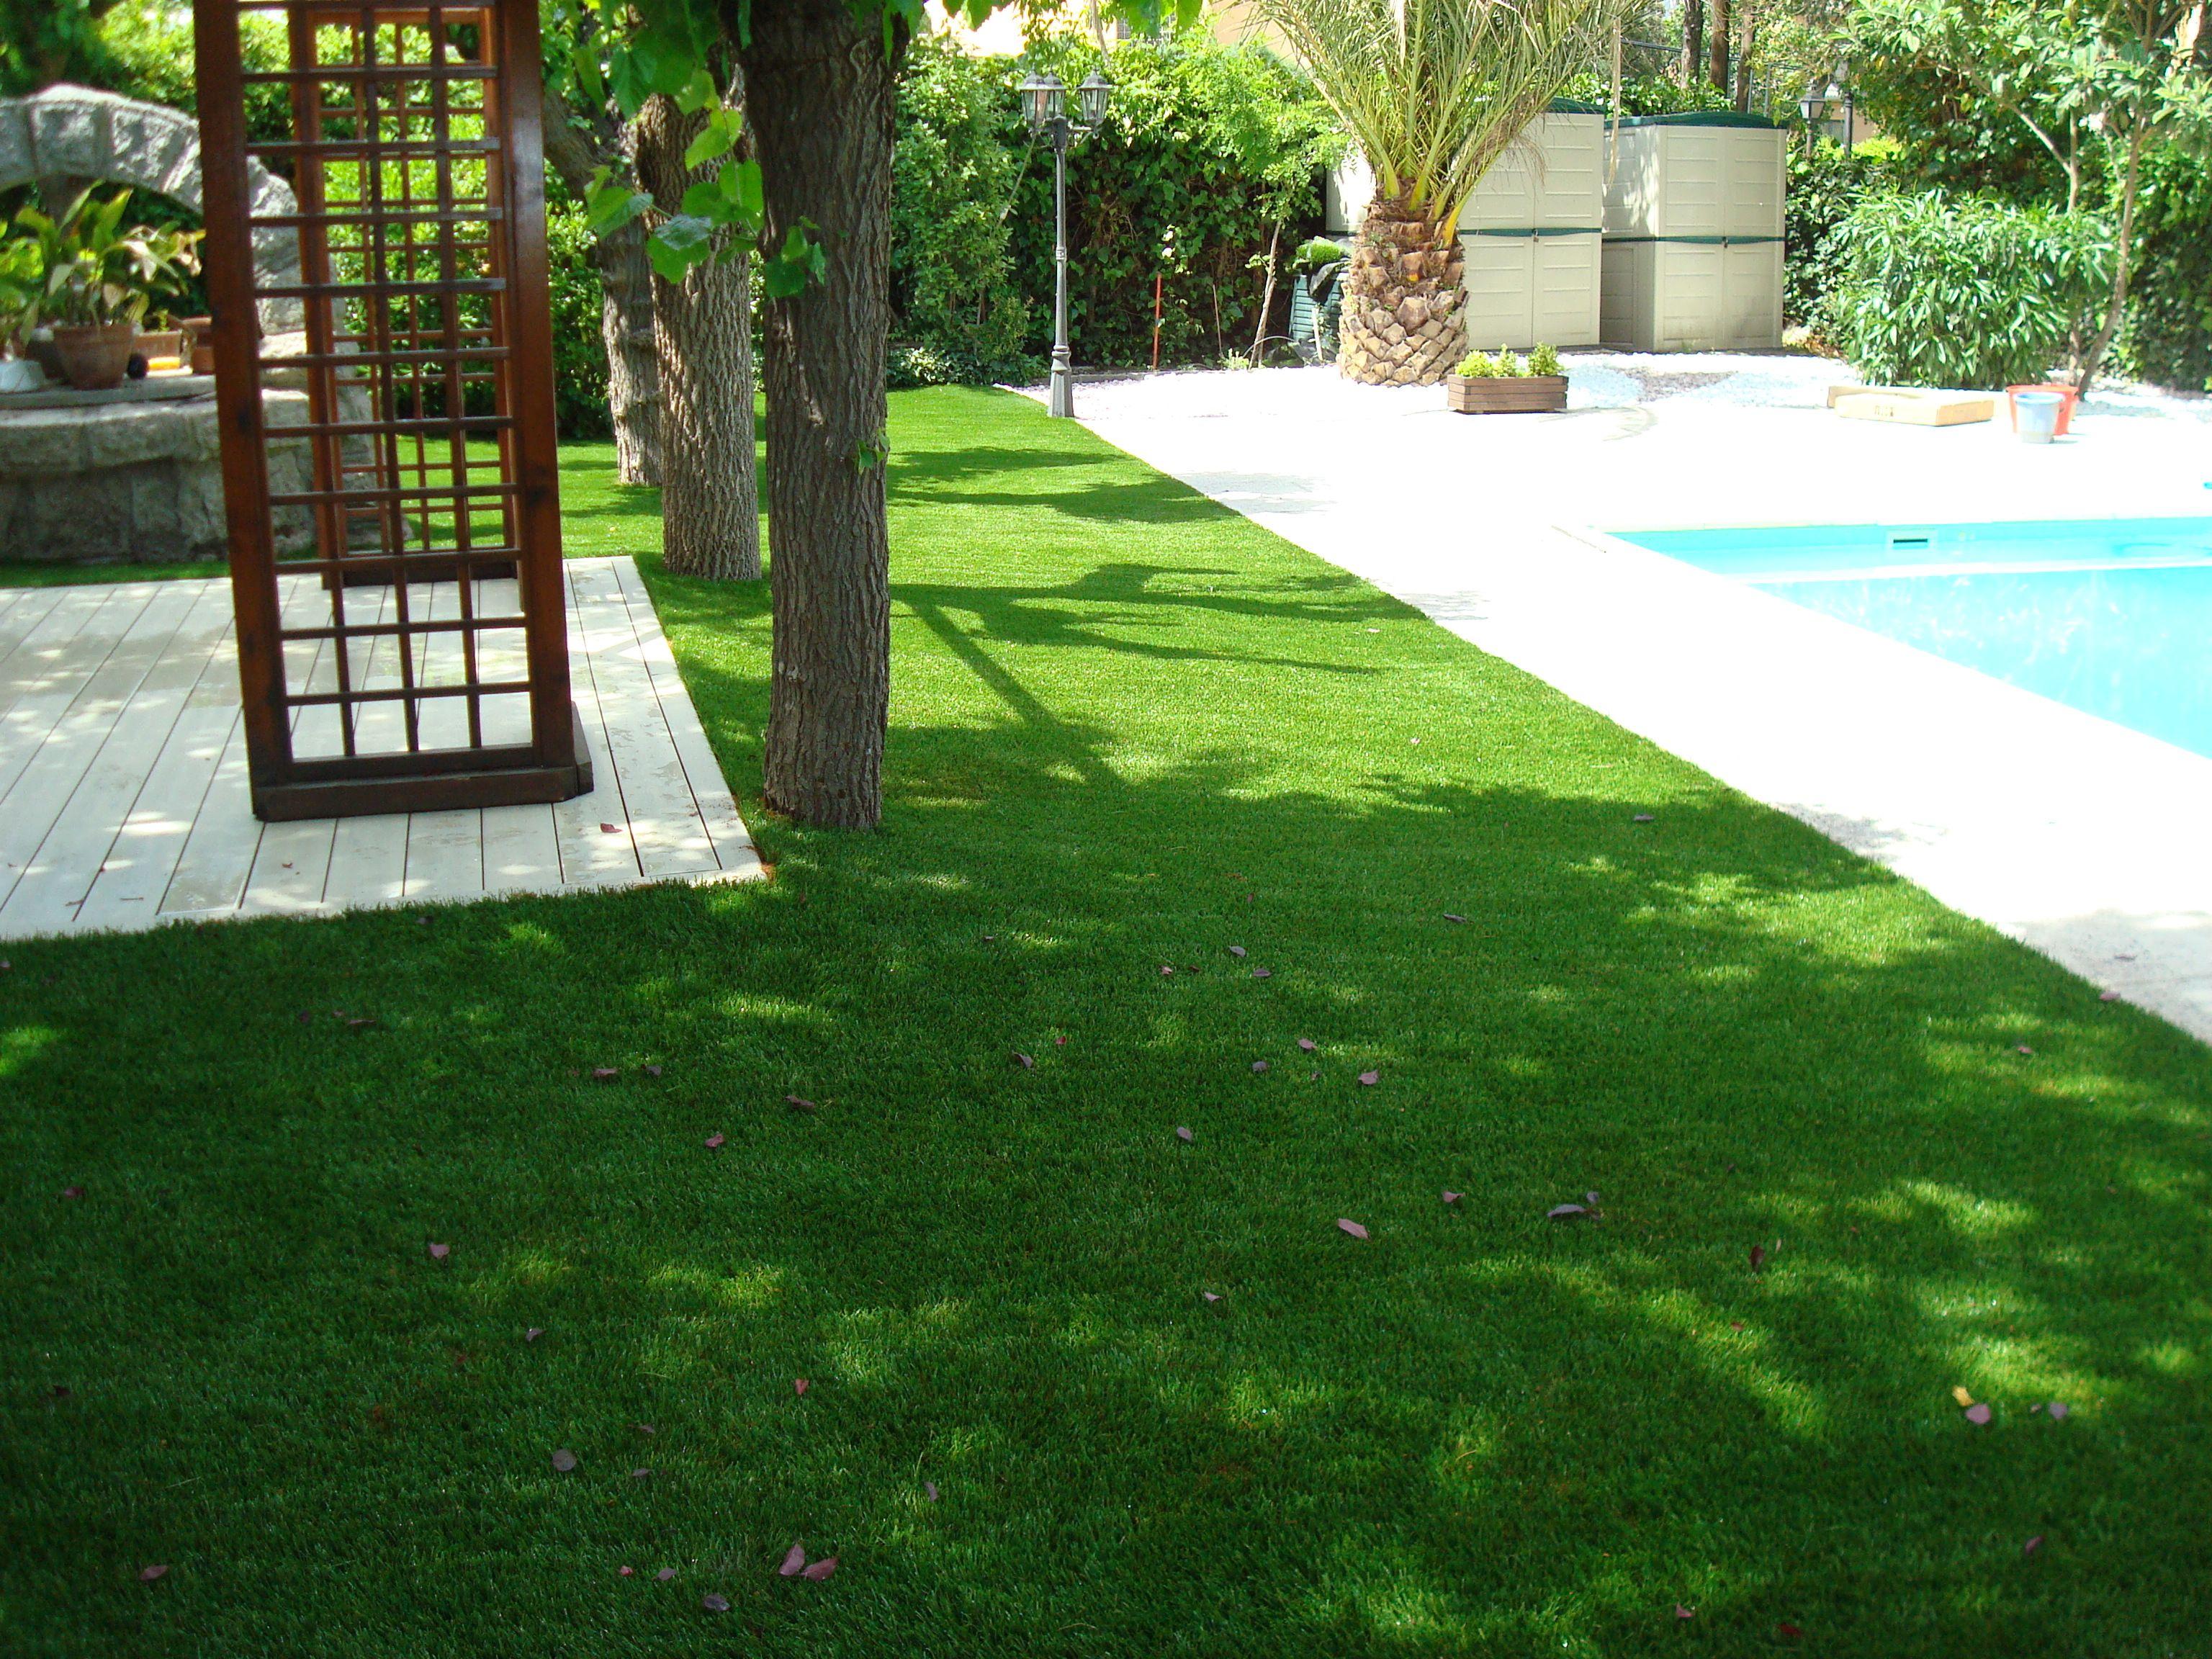 Cesped artificial para jardines #cesped_artificial | césped ...